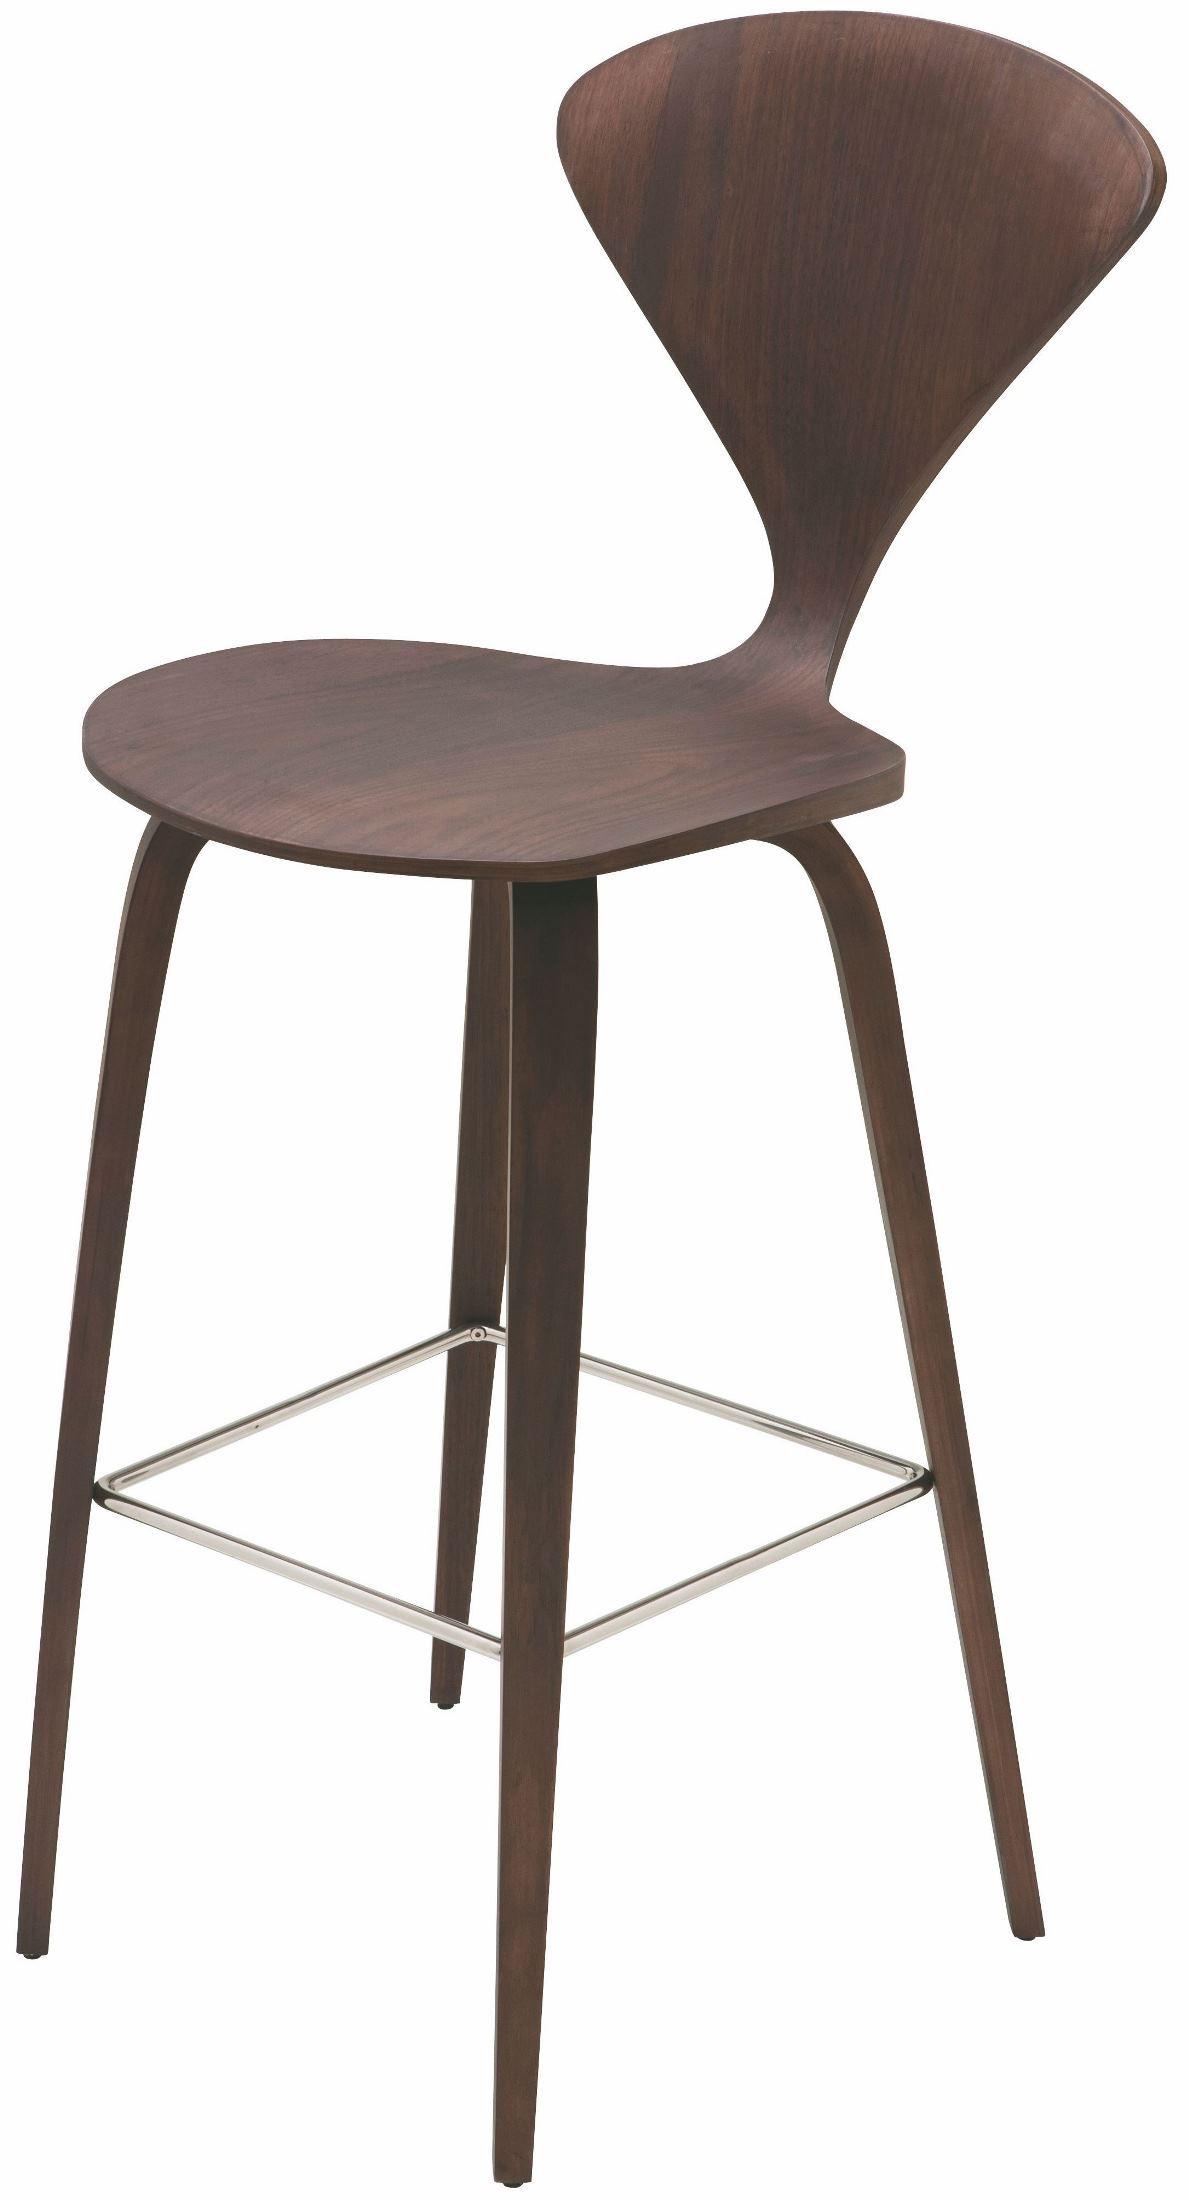 Satine dark walnut wood bar stool hgem353 nuevo for Dark wood bar stools